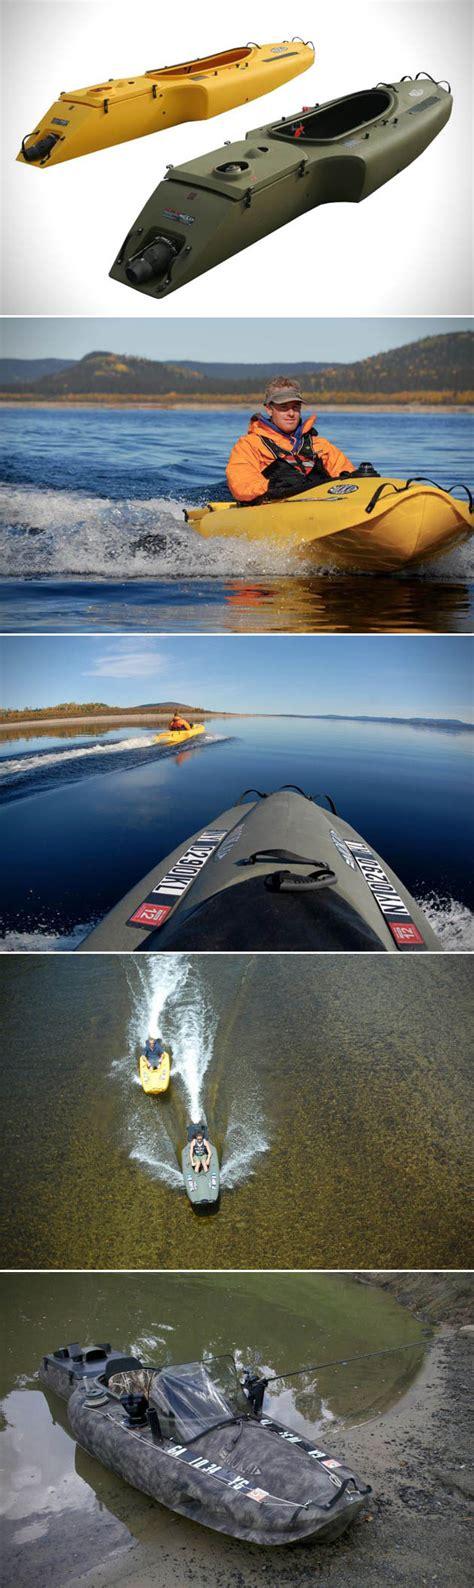 mokai motorized kayak mokai motorized kayak pictures to pin on pinsdaddy